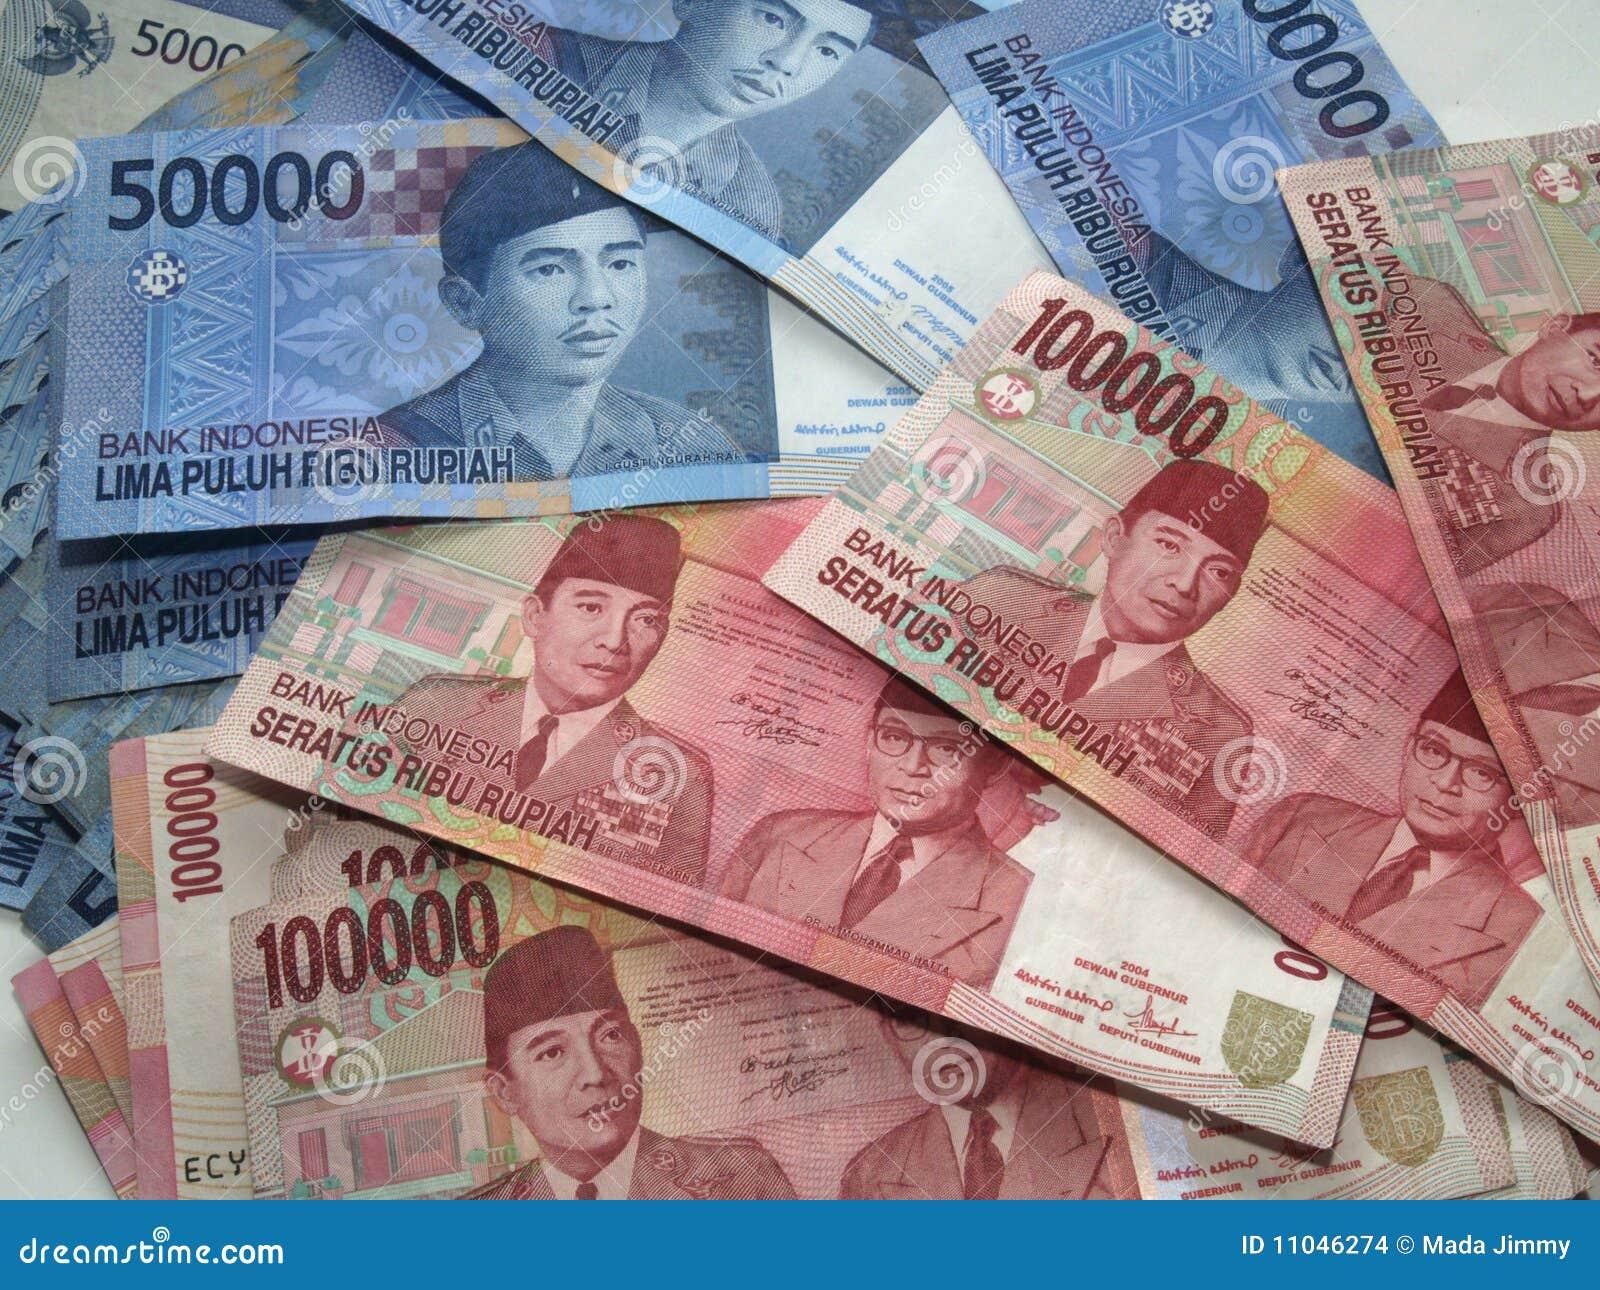 Millionaire forex trader reveals secret method